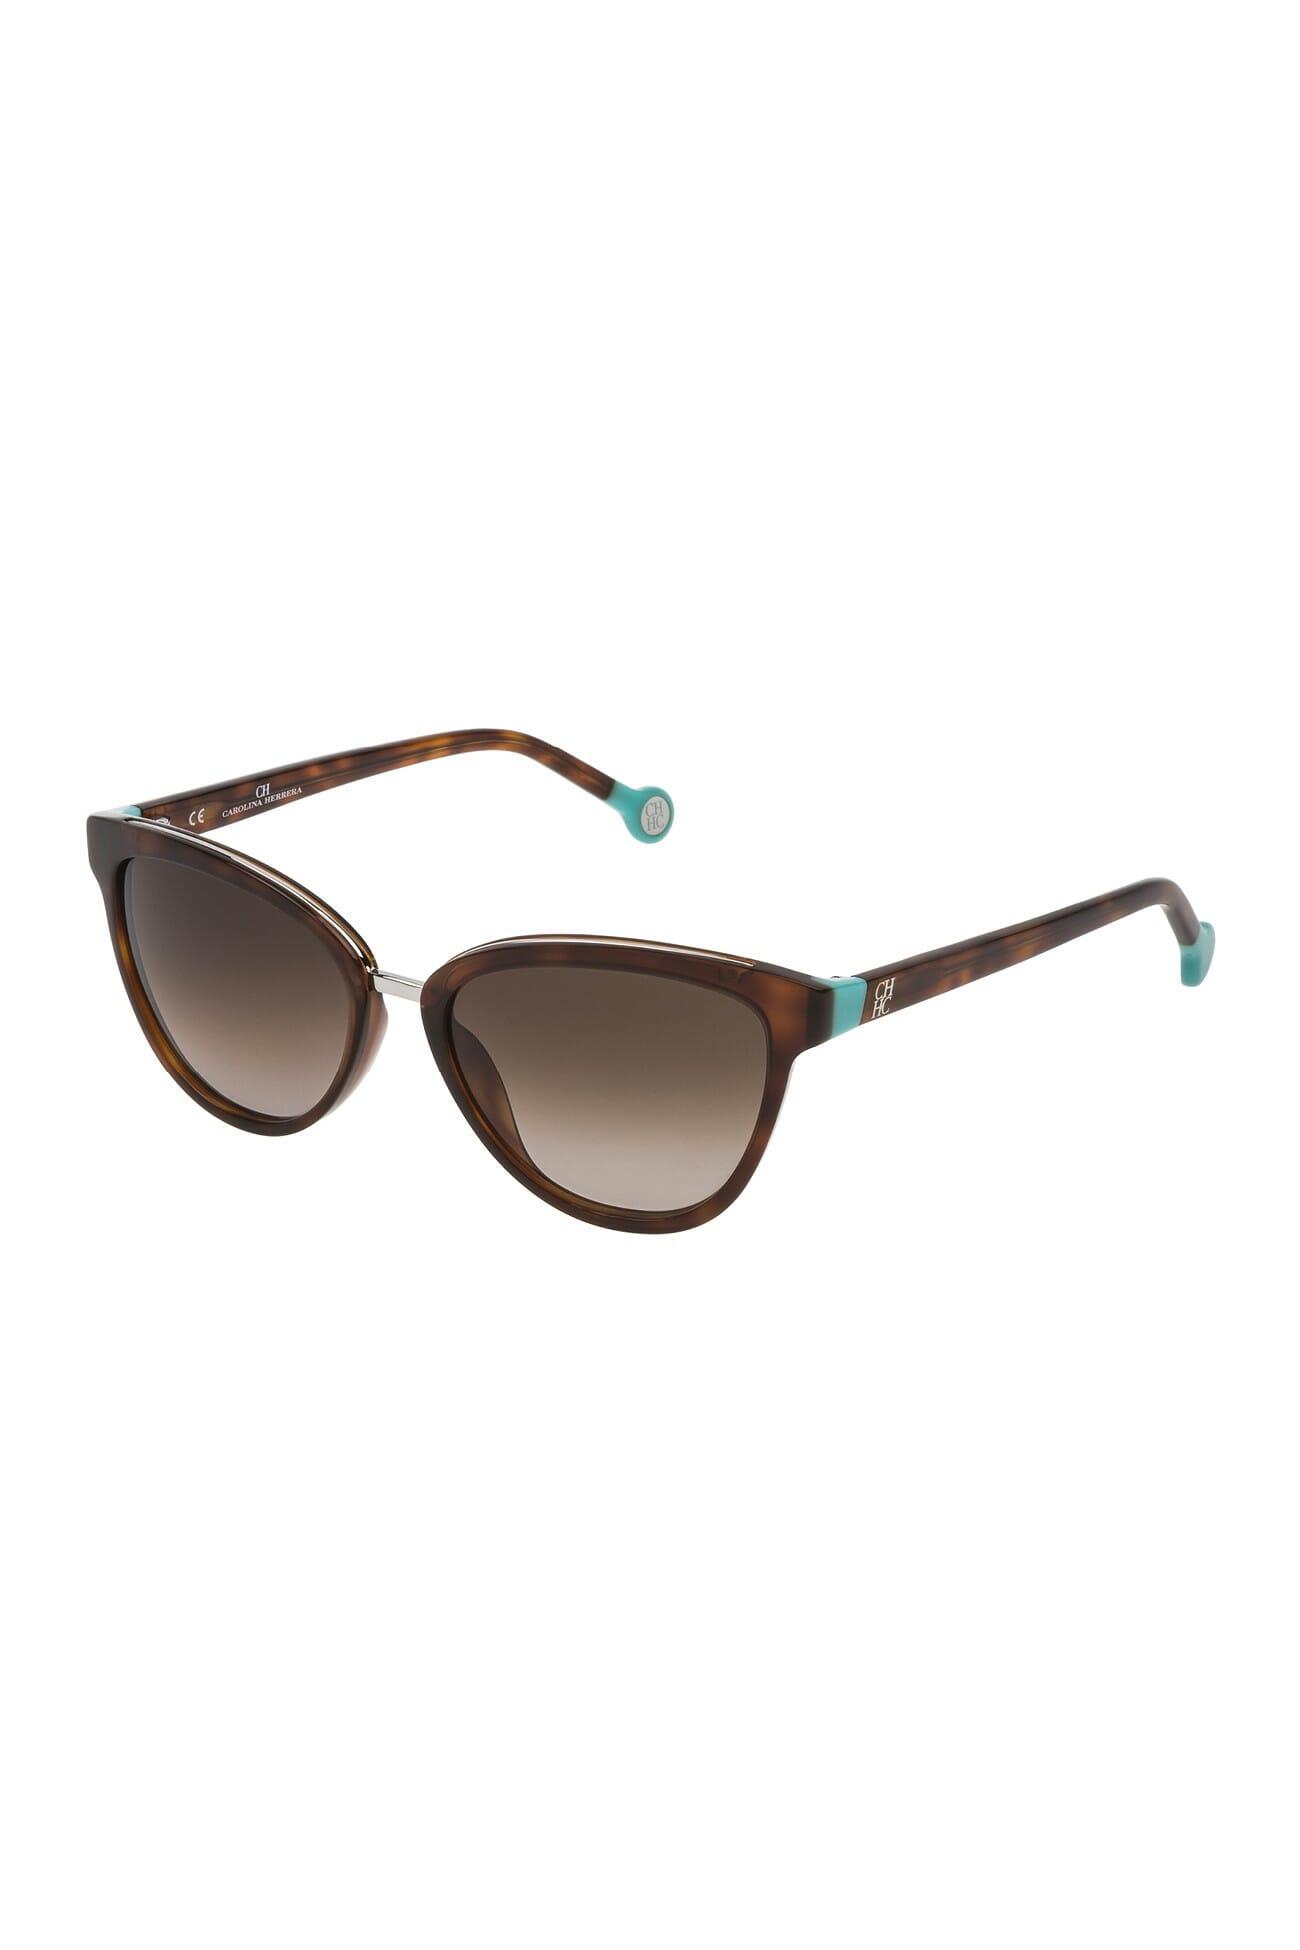 93d93a32185b Carolina Herrera Sunglasses Ca833